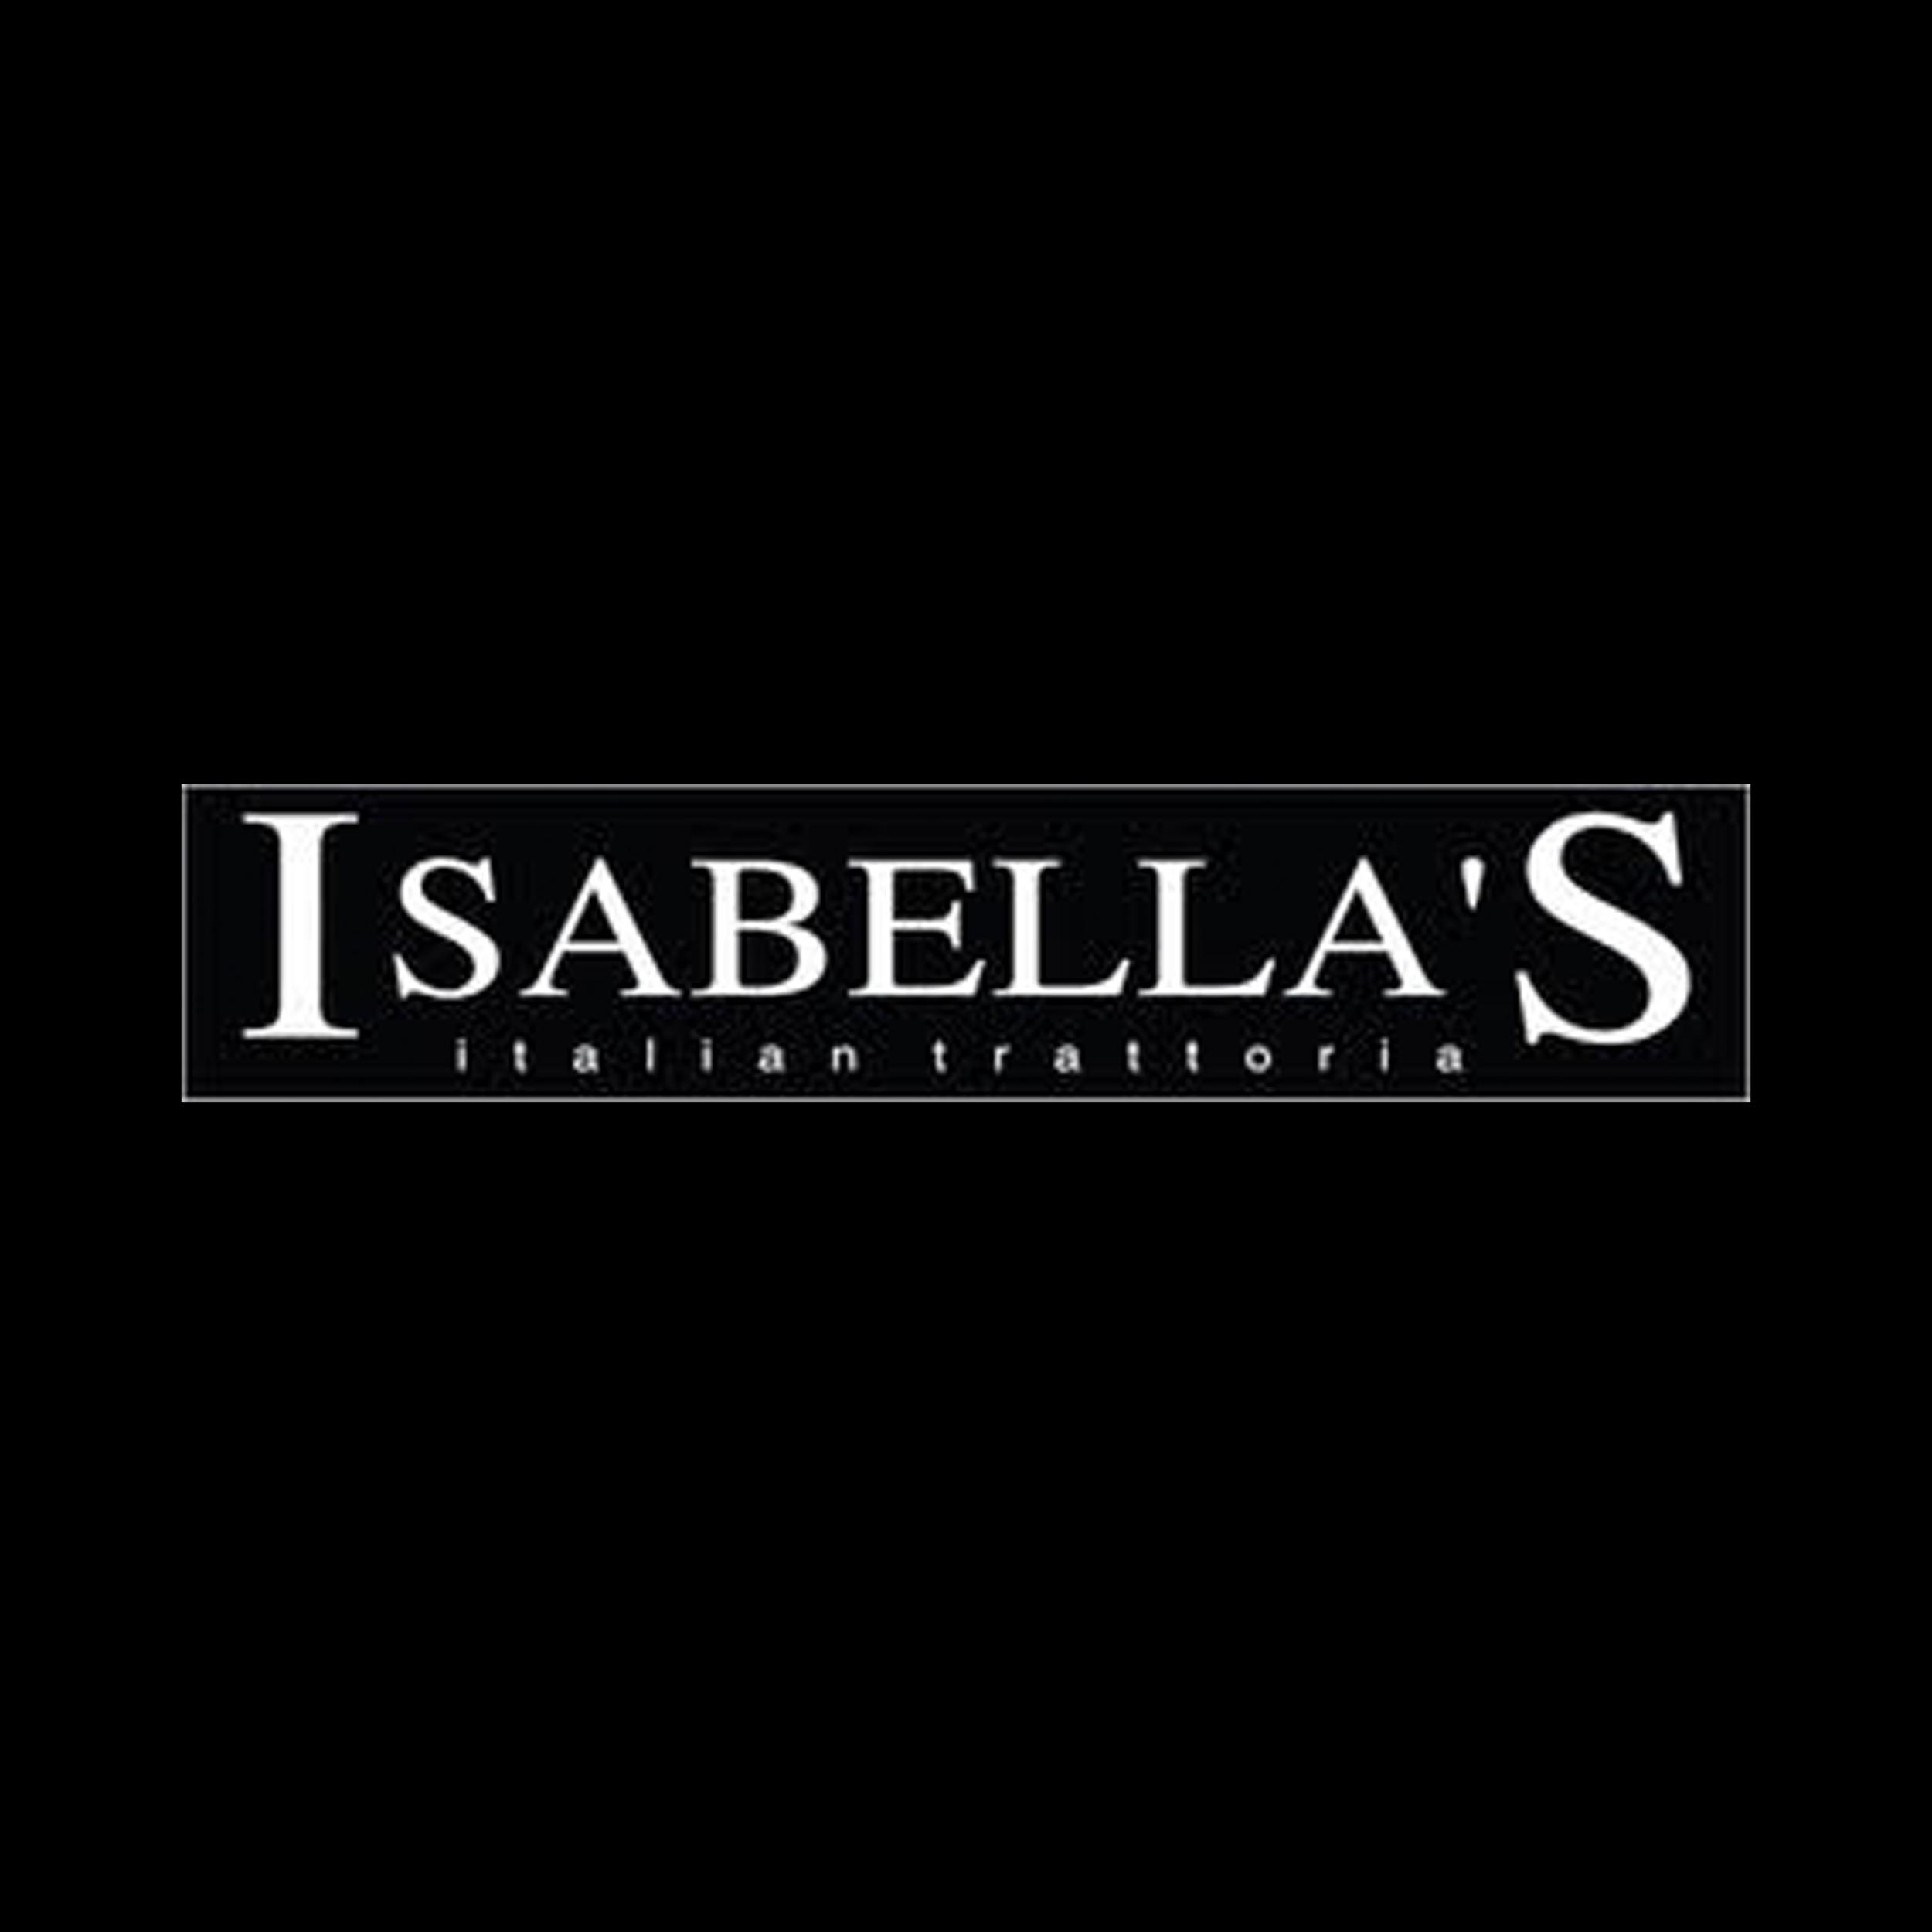 Isabella's Italian Trattoria - $100 Gift Card